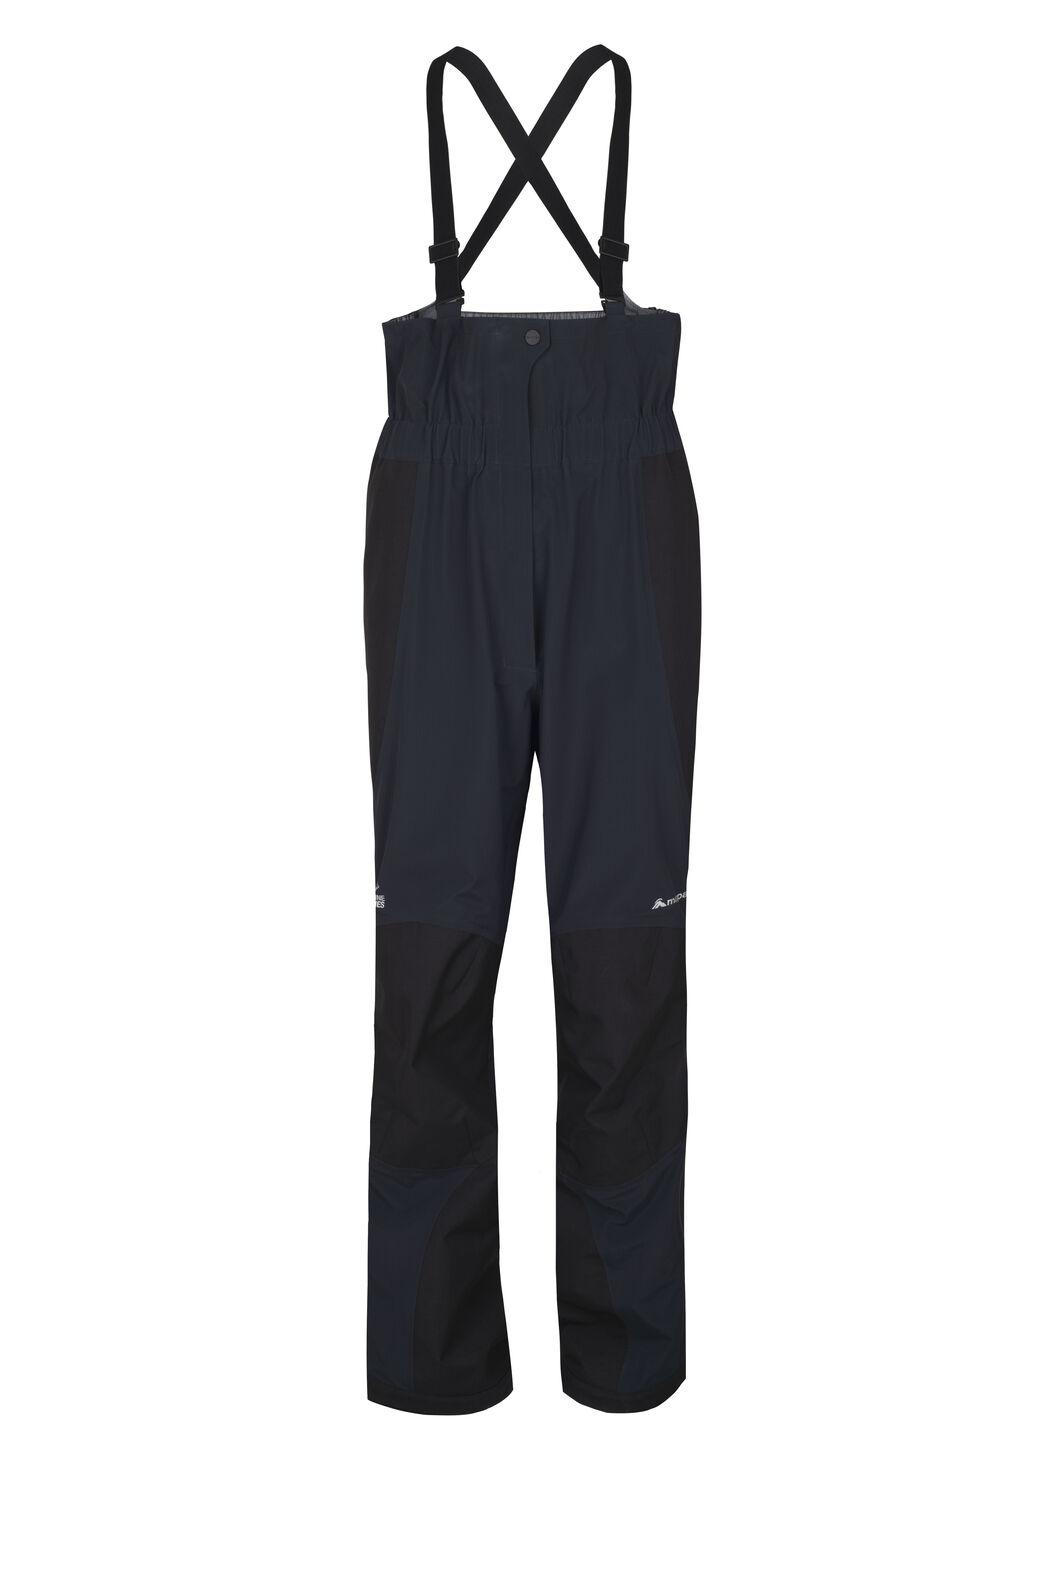 Macpac Barrier Bib Pertex® Rain Pants - Women's, Black, hi-res